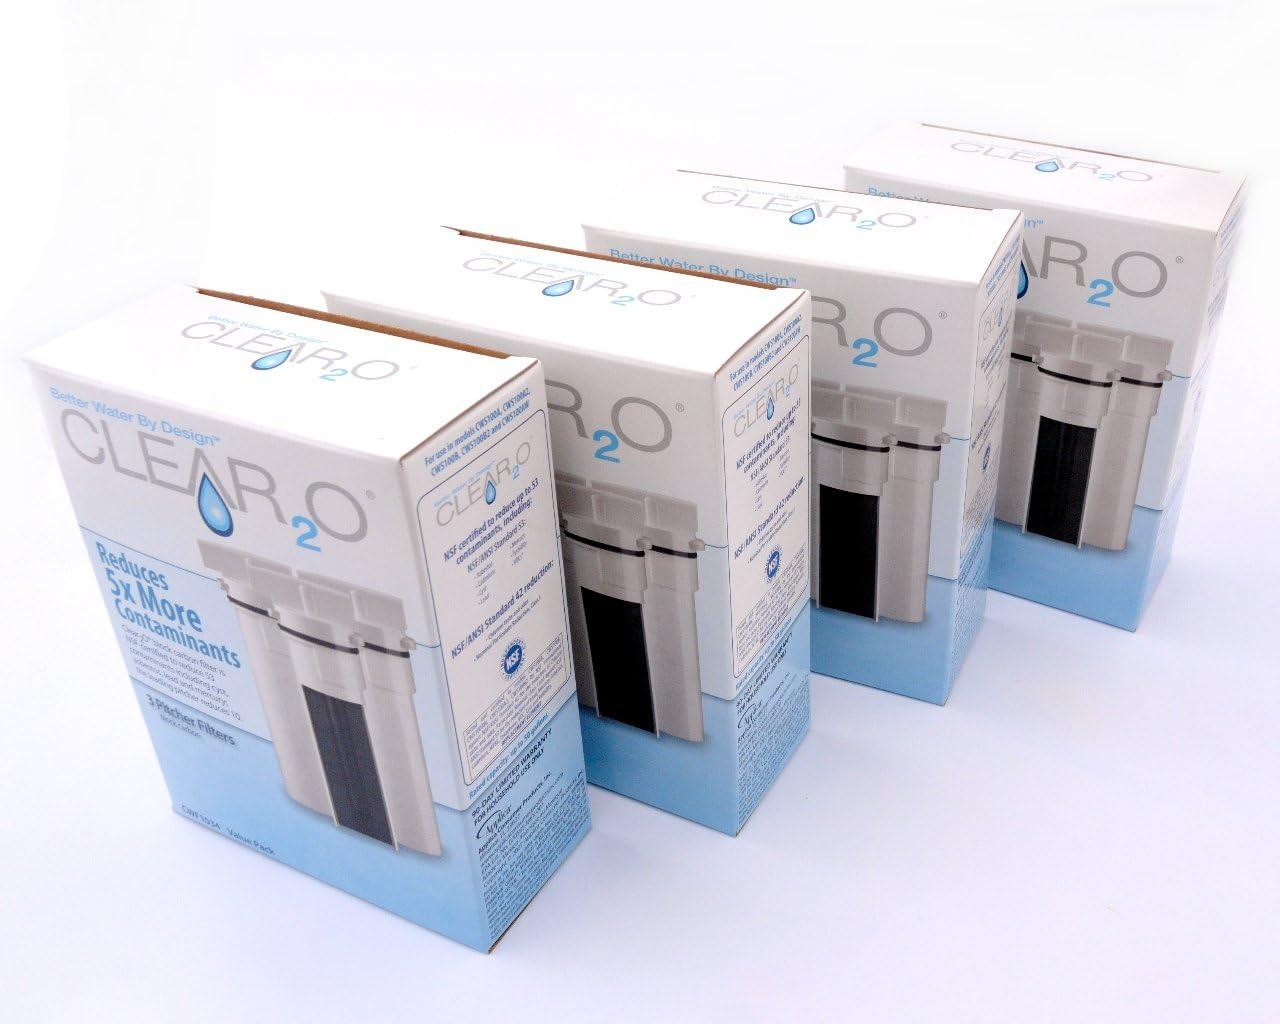 6 Clear2o Water Filters New in box CWF1034 CWF1016 CWF1032 CWF1012 CWF104 Filter